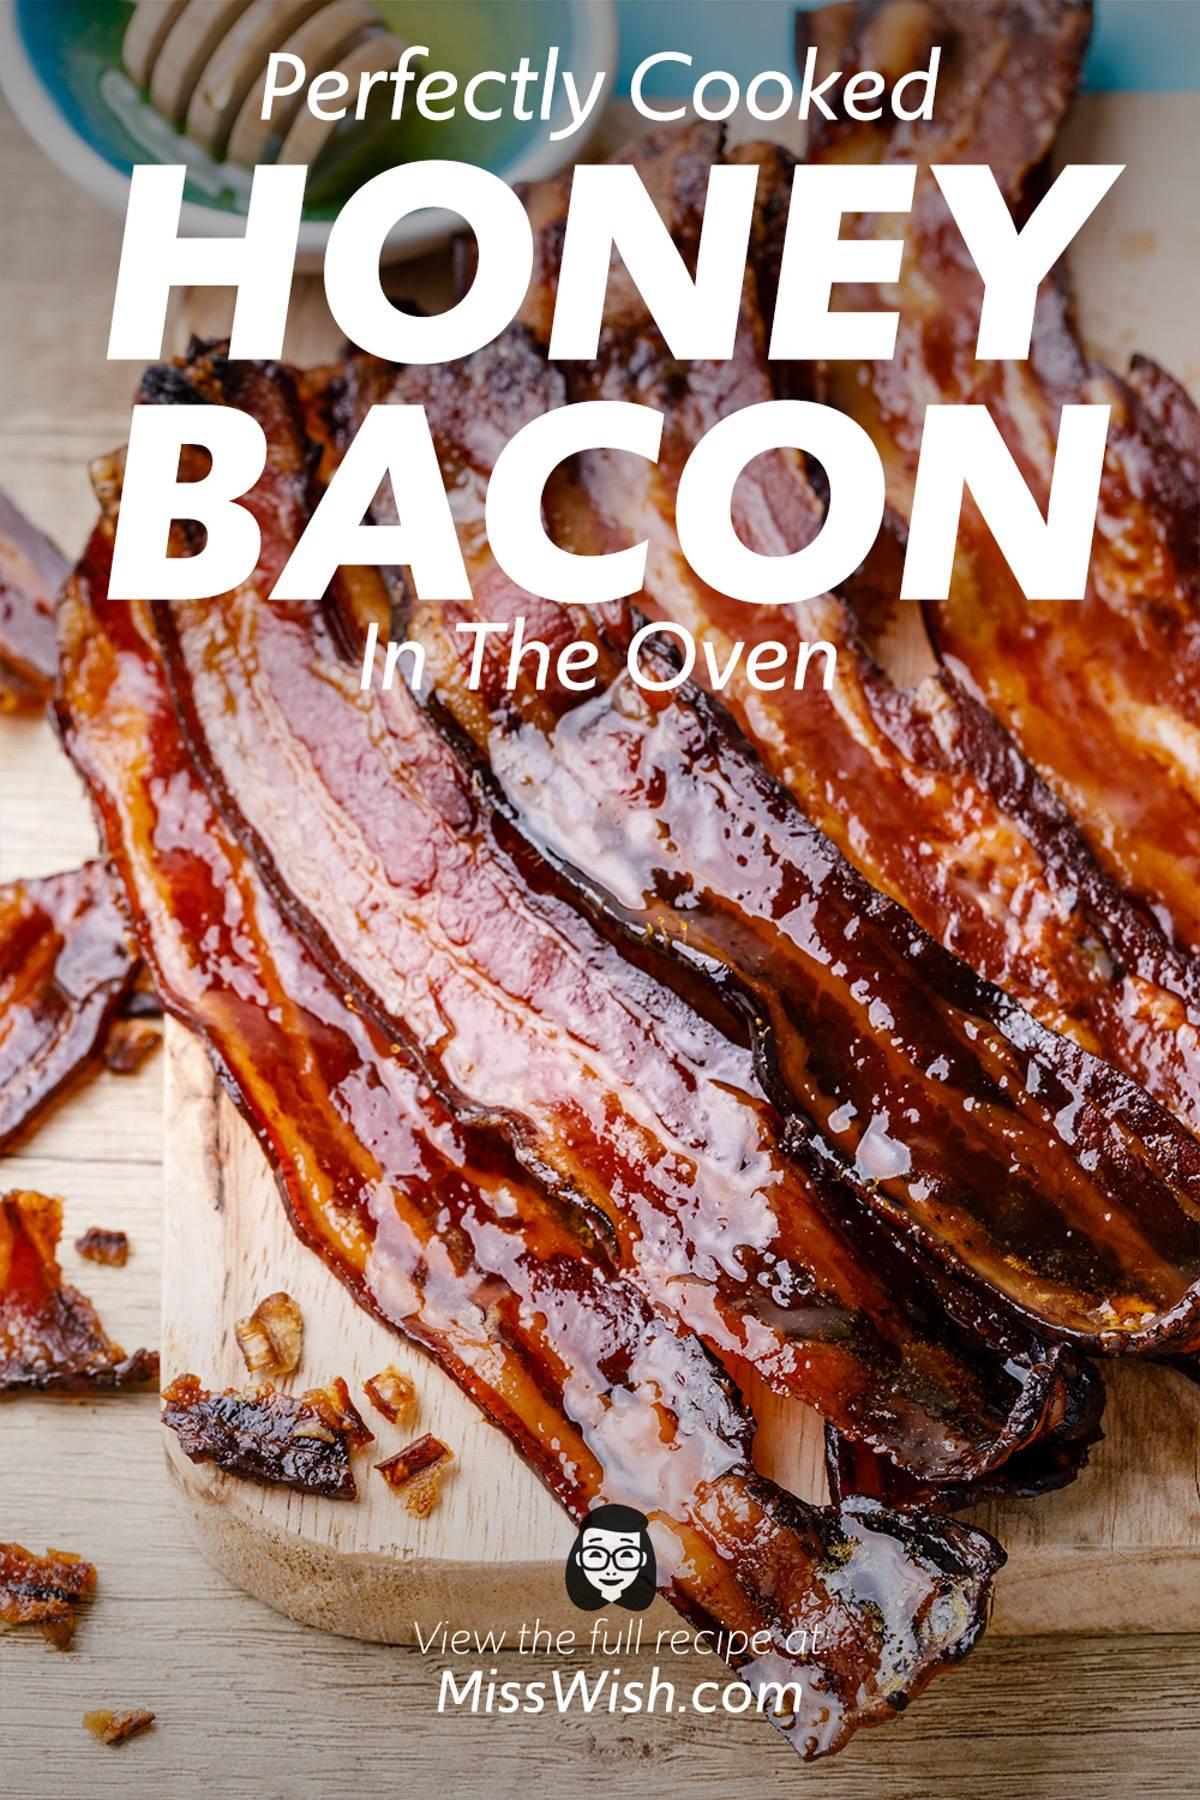 2-Ingredient Honey Bacon in the Oven